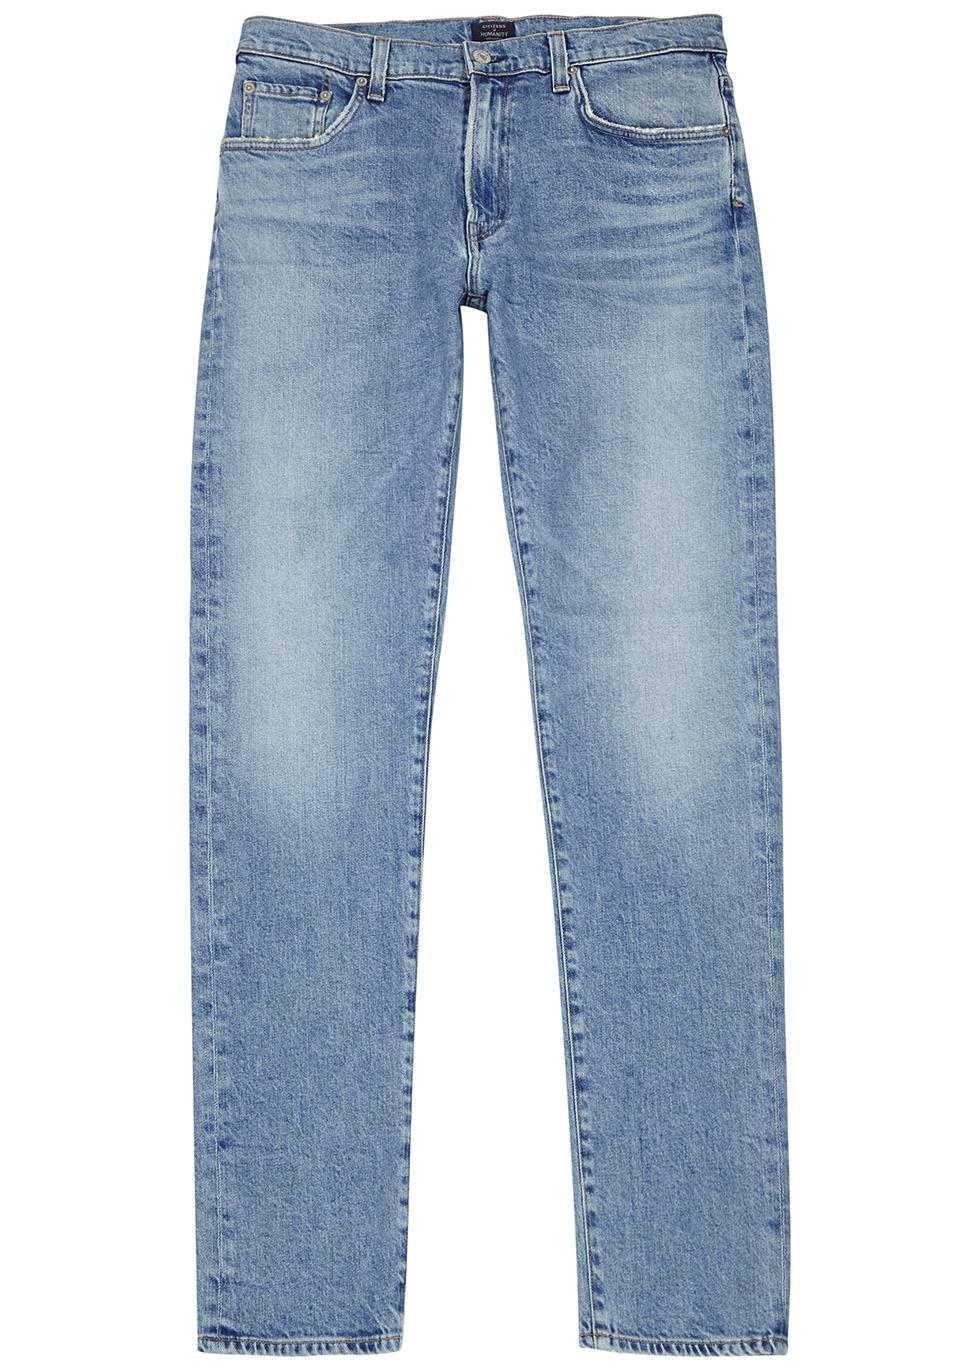 Bowery blue slim-leg jeans